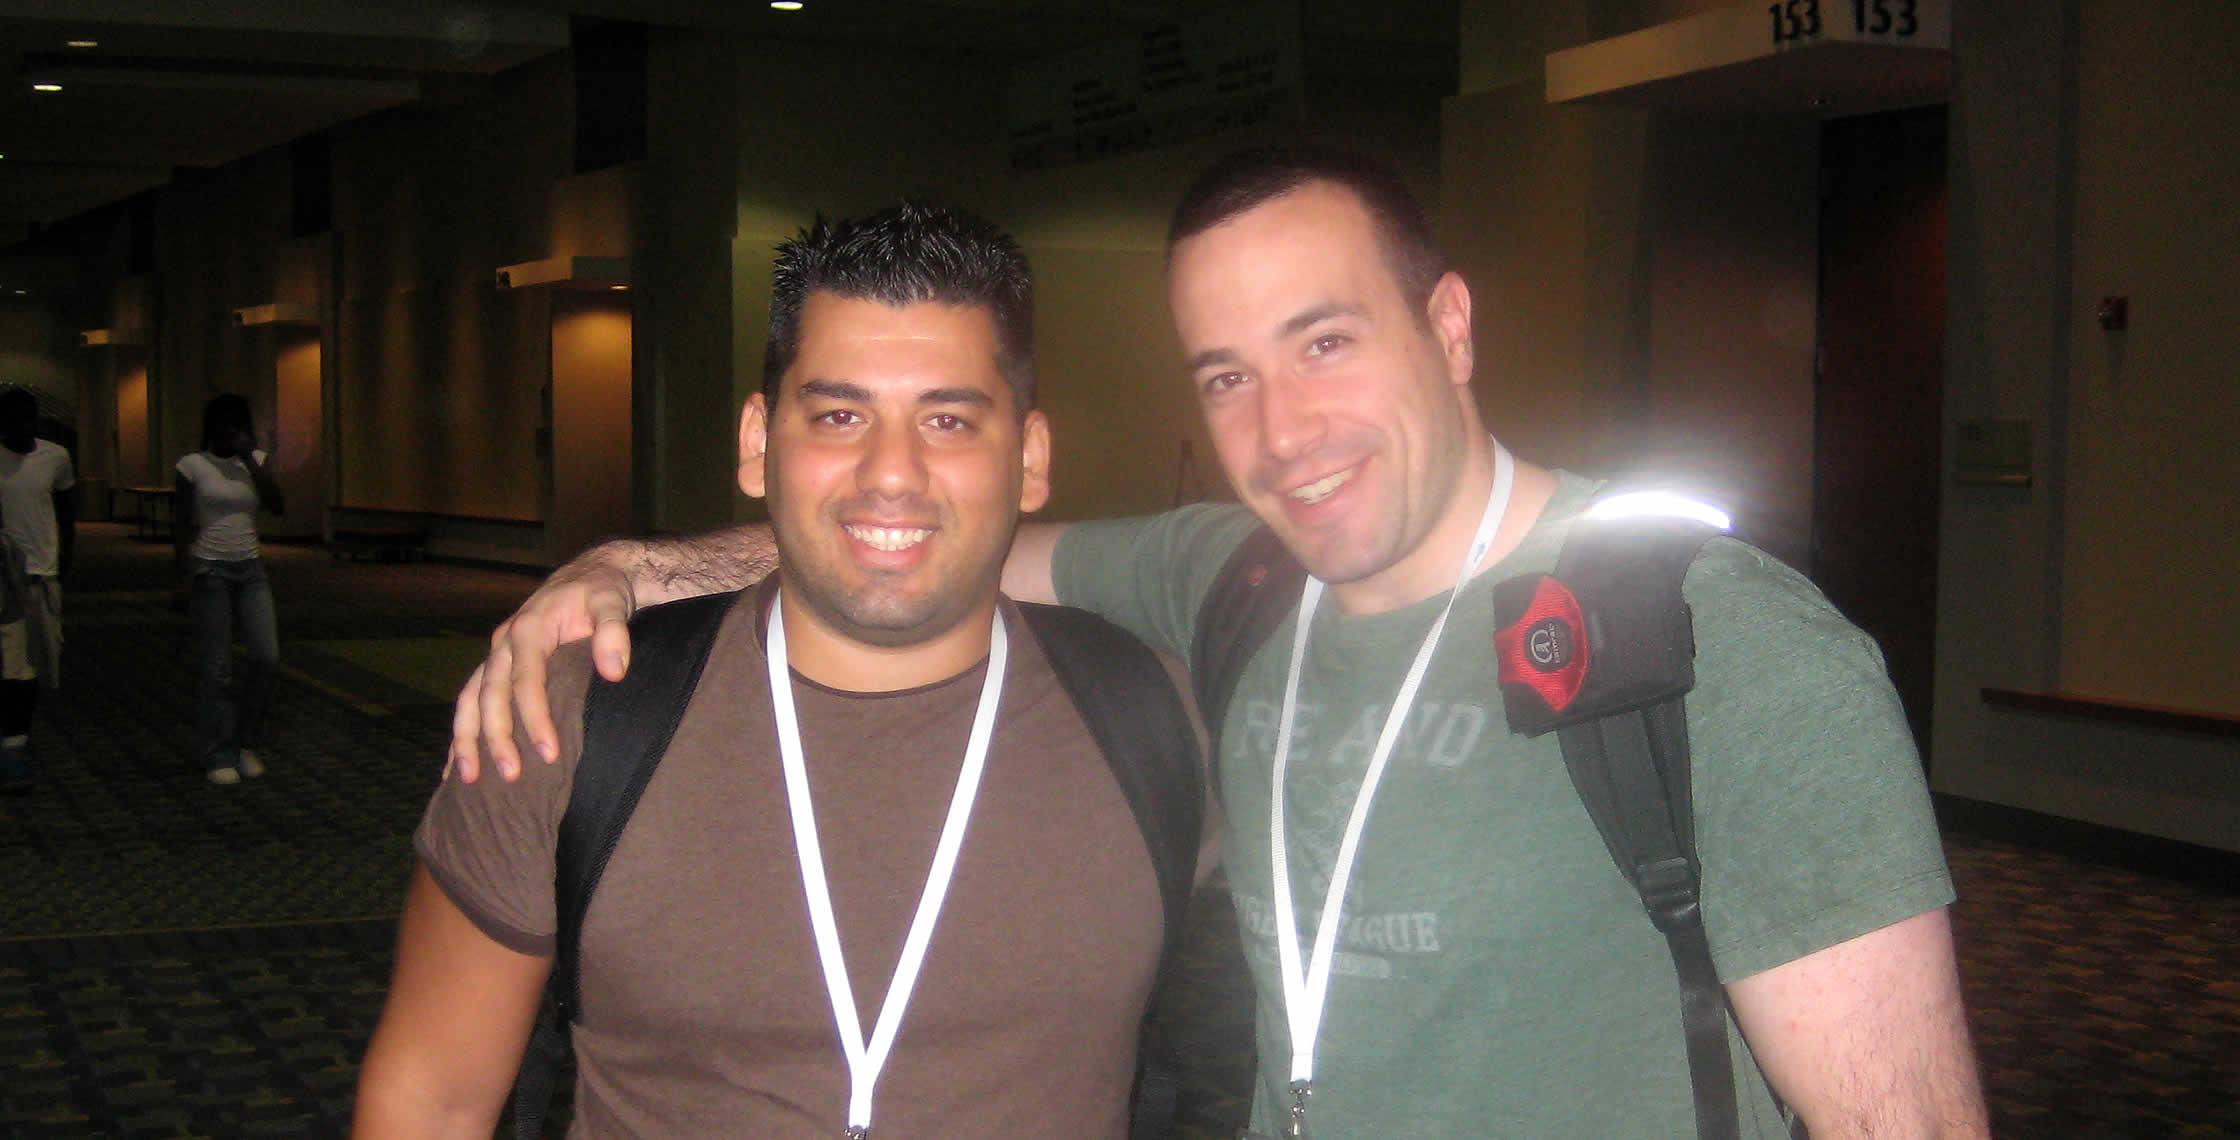 Ben Nadel at CFUNITED 2008 (Washington, D.C.) with: Yaron Kohn